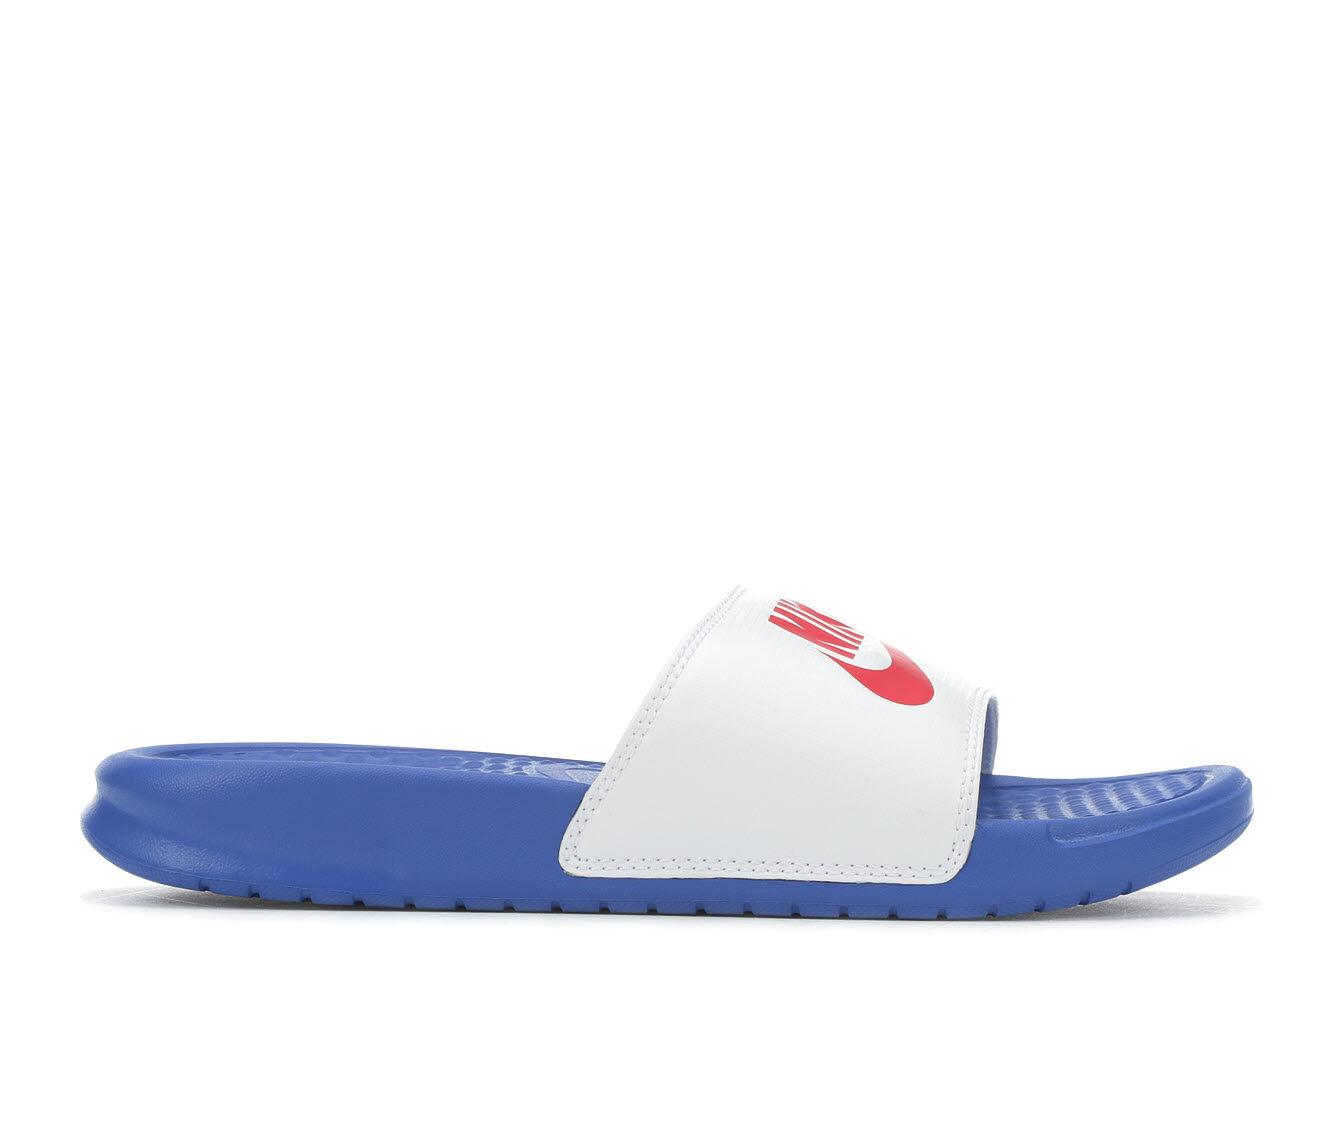 nike slides women shoe carnival